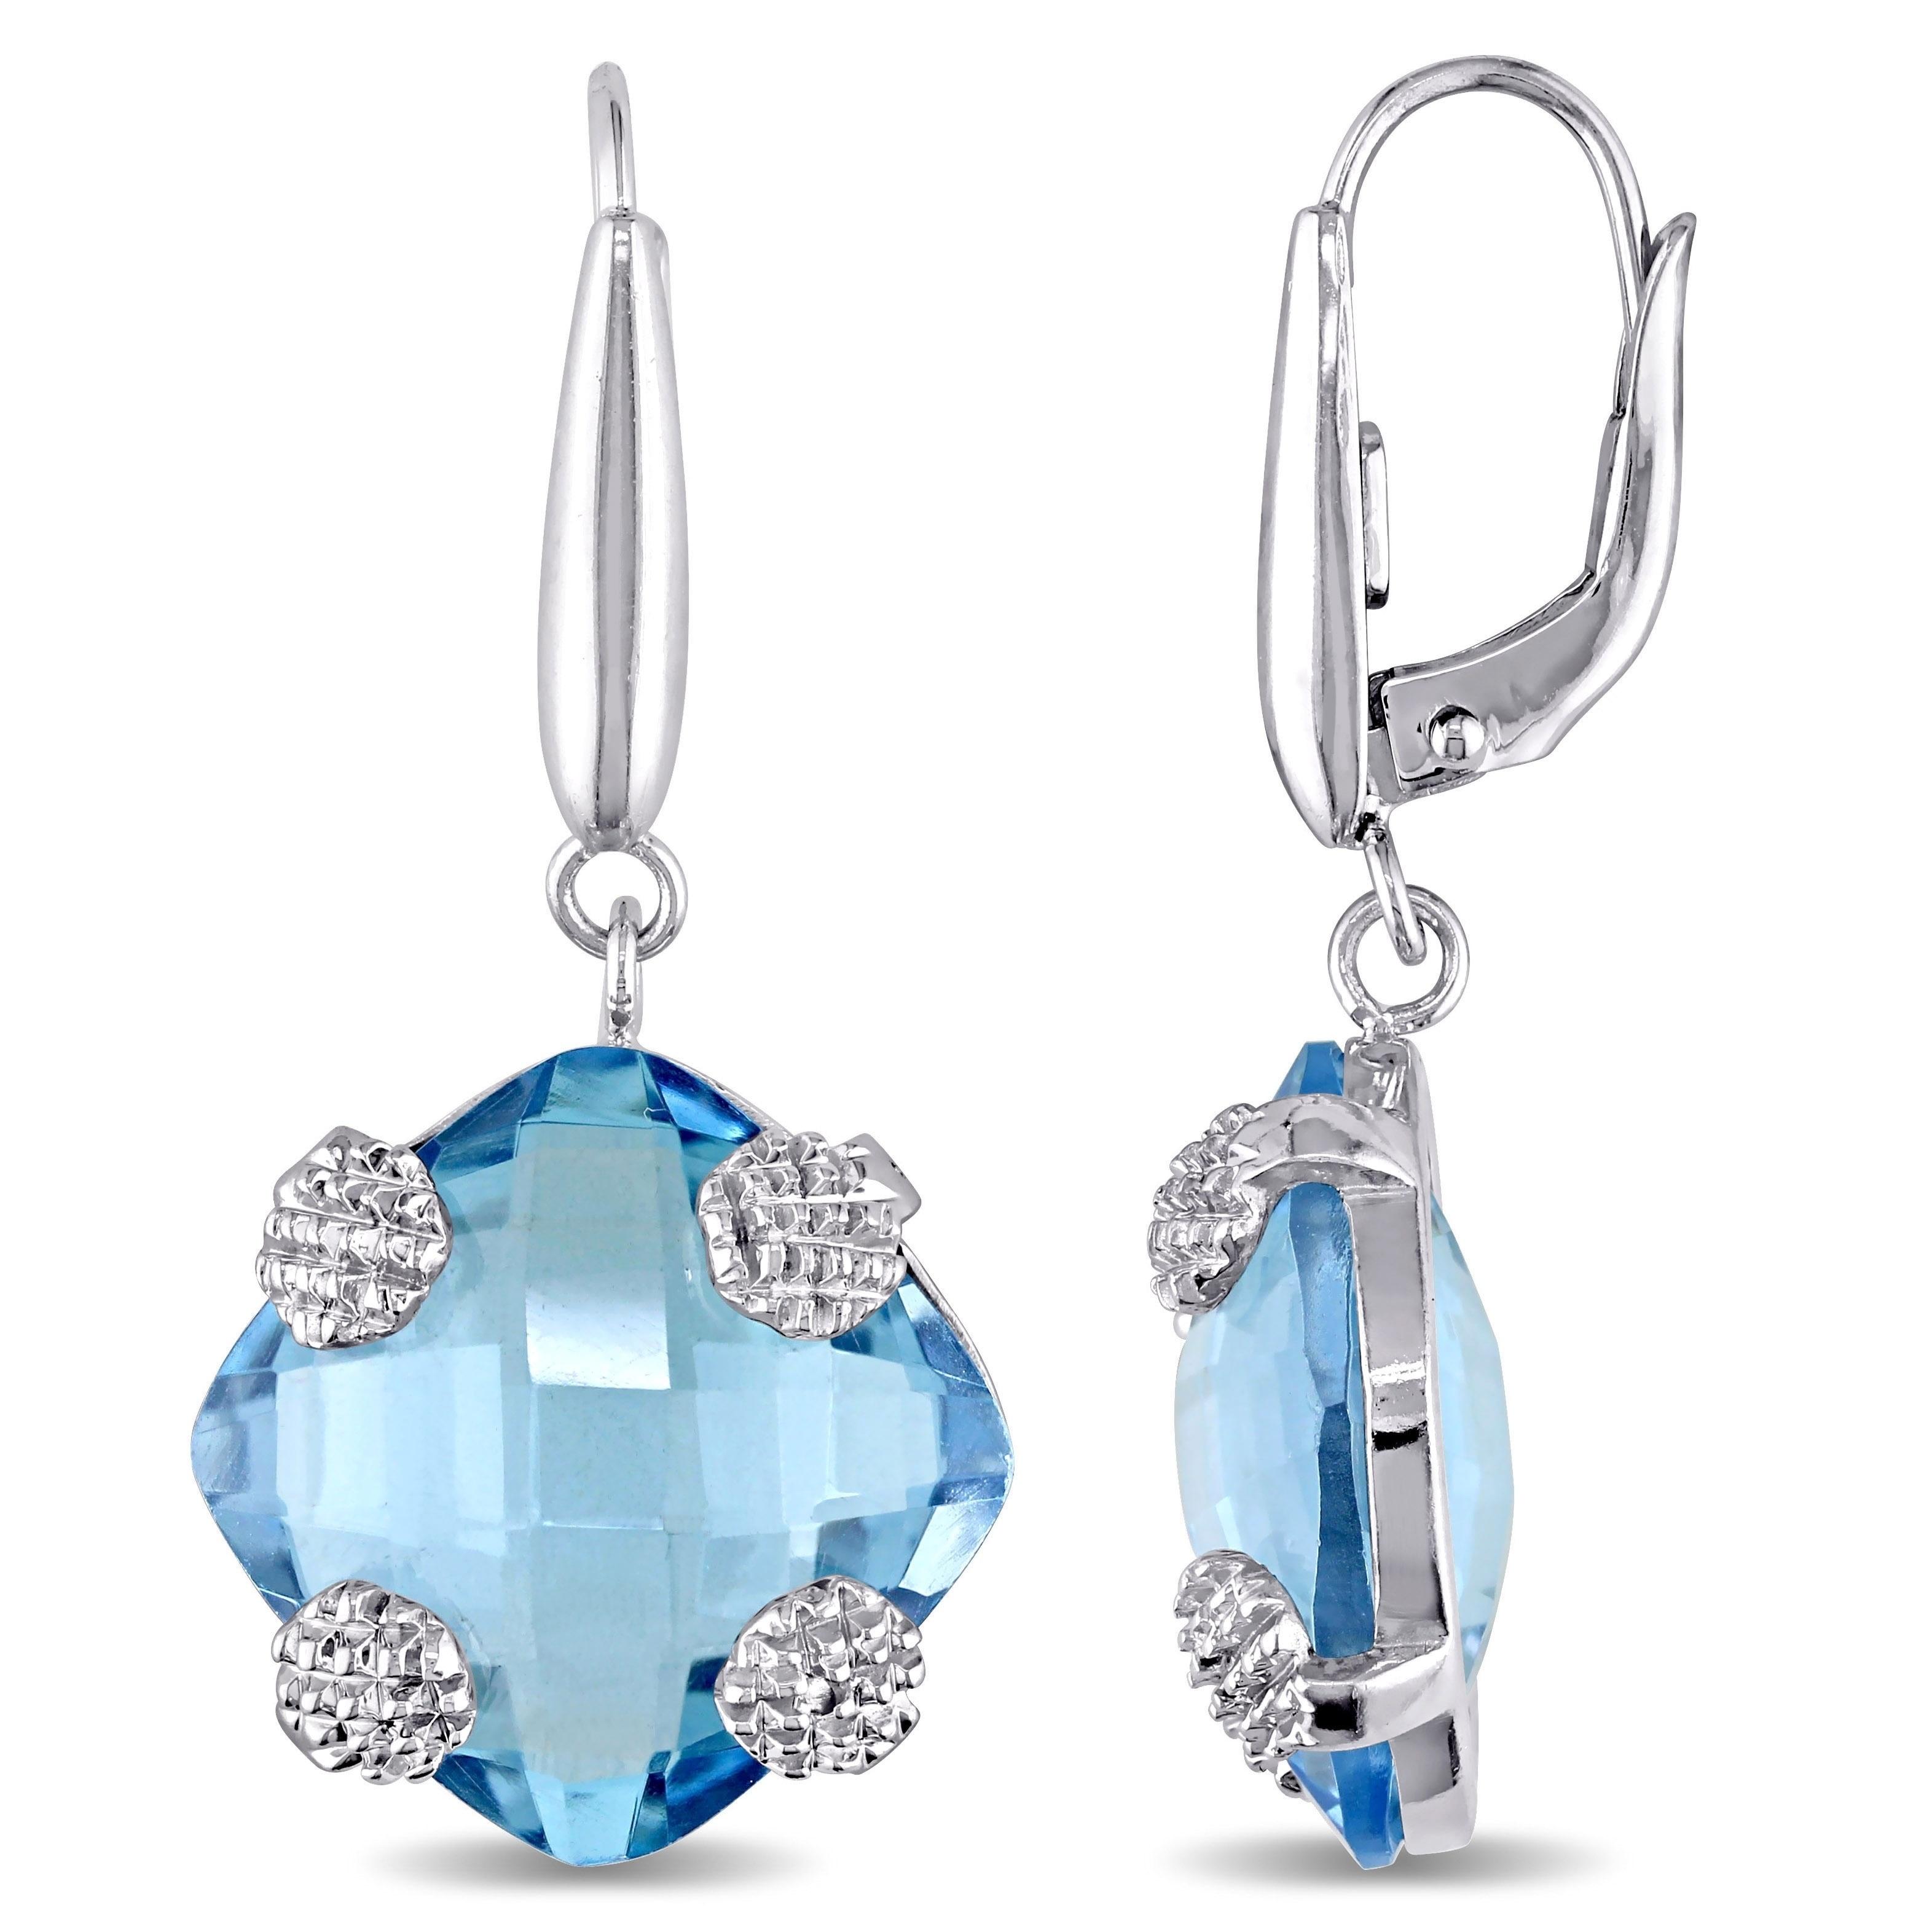 square cushion Blue Topaz Gemstone Earring